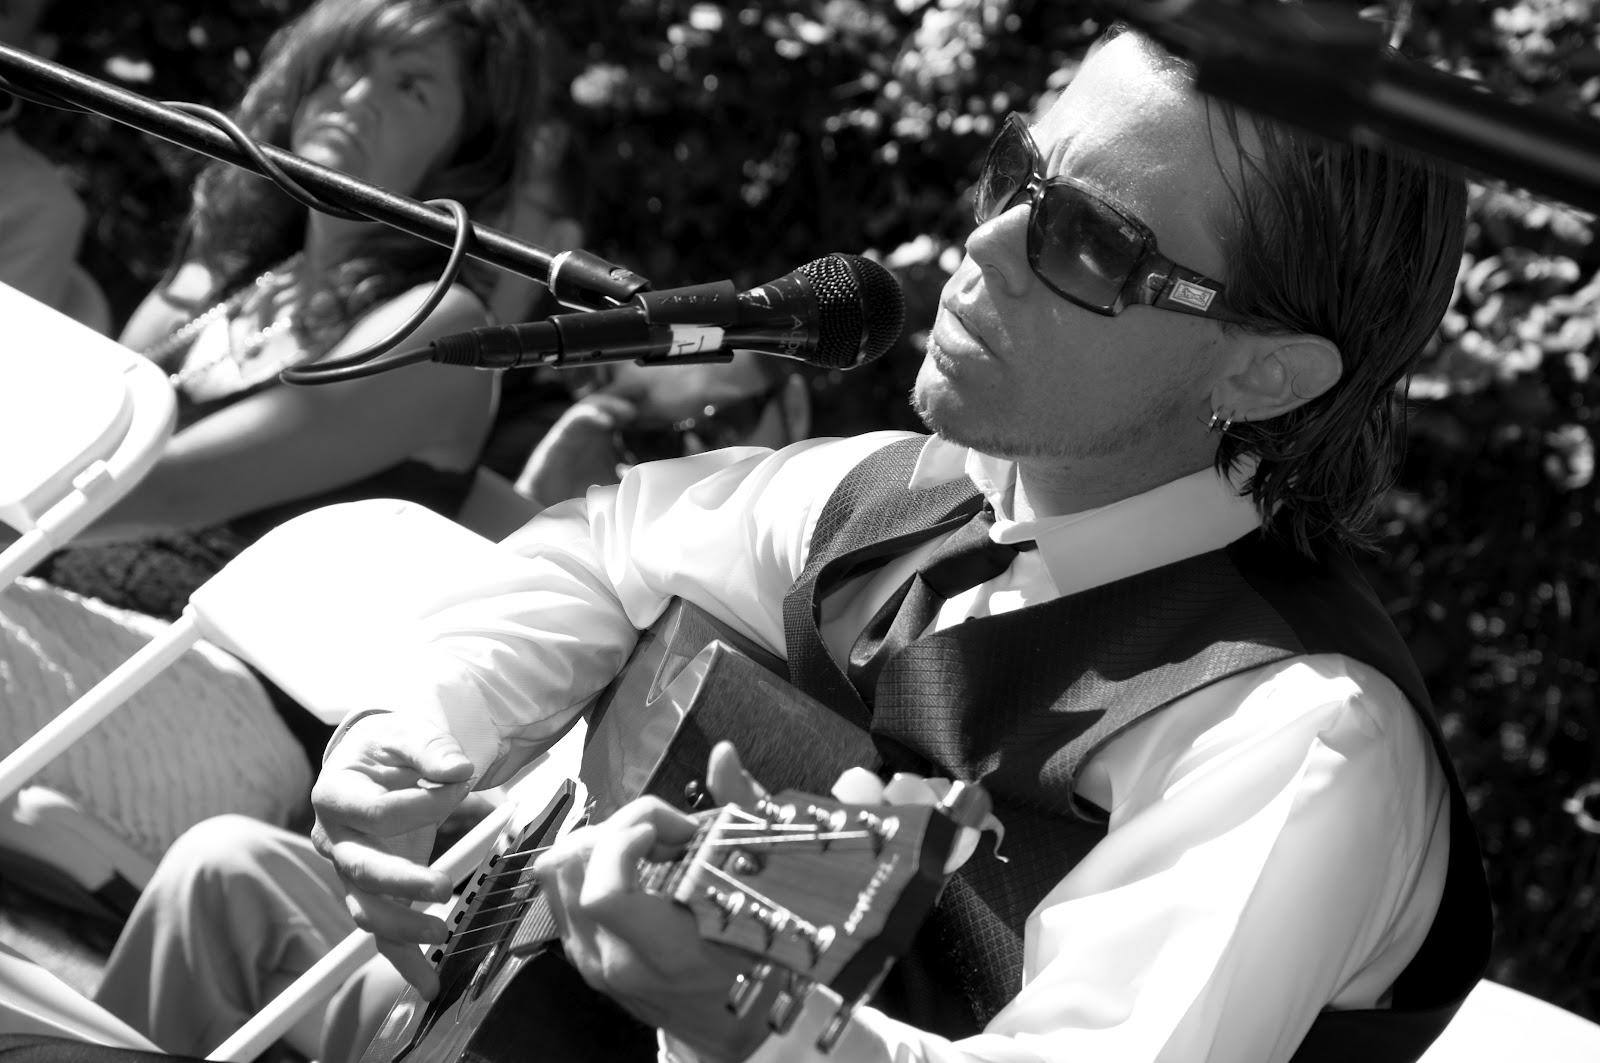 saint_george_utah_cedar_city_utah_zion_canyon_wedding_music_acoustic_singer_songwriter_wedding_ceremony10.jpg